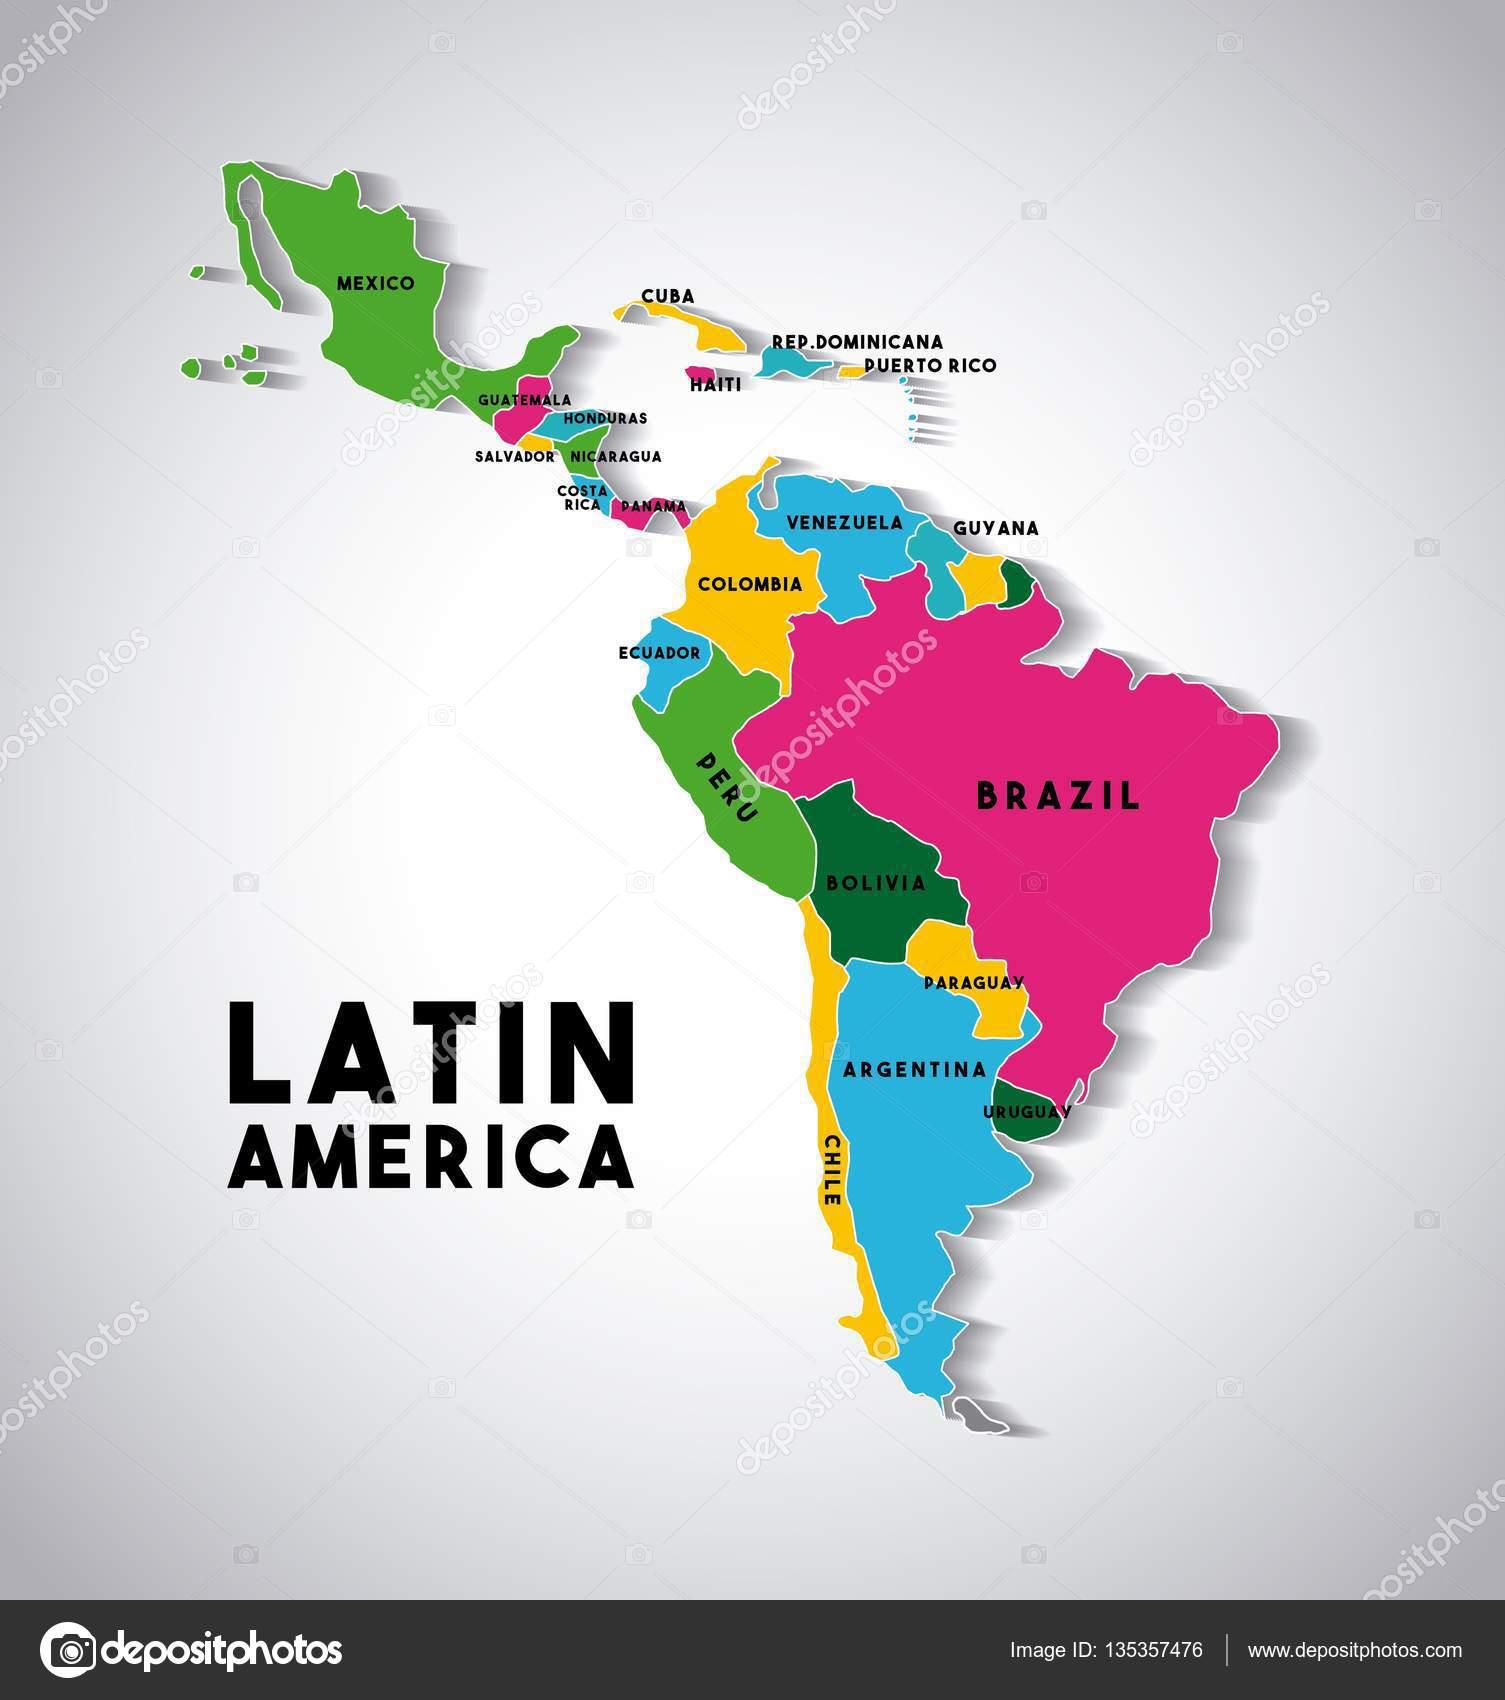 Carte Cuba Amerique.Carte De L Amerique Latine Image Vectorielle Yupiramos C 135357476